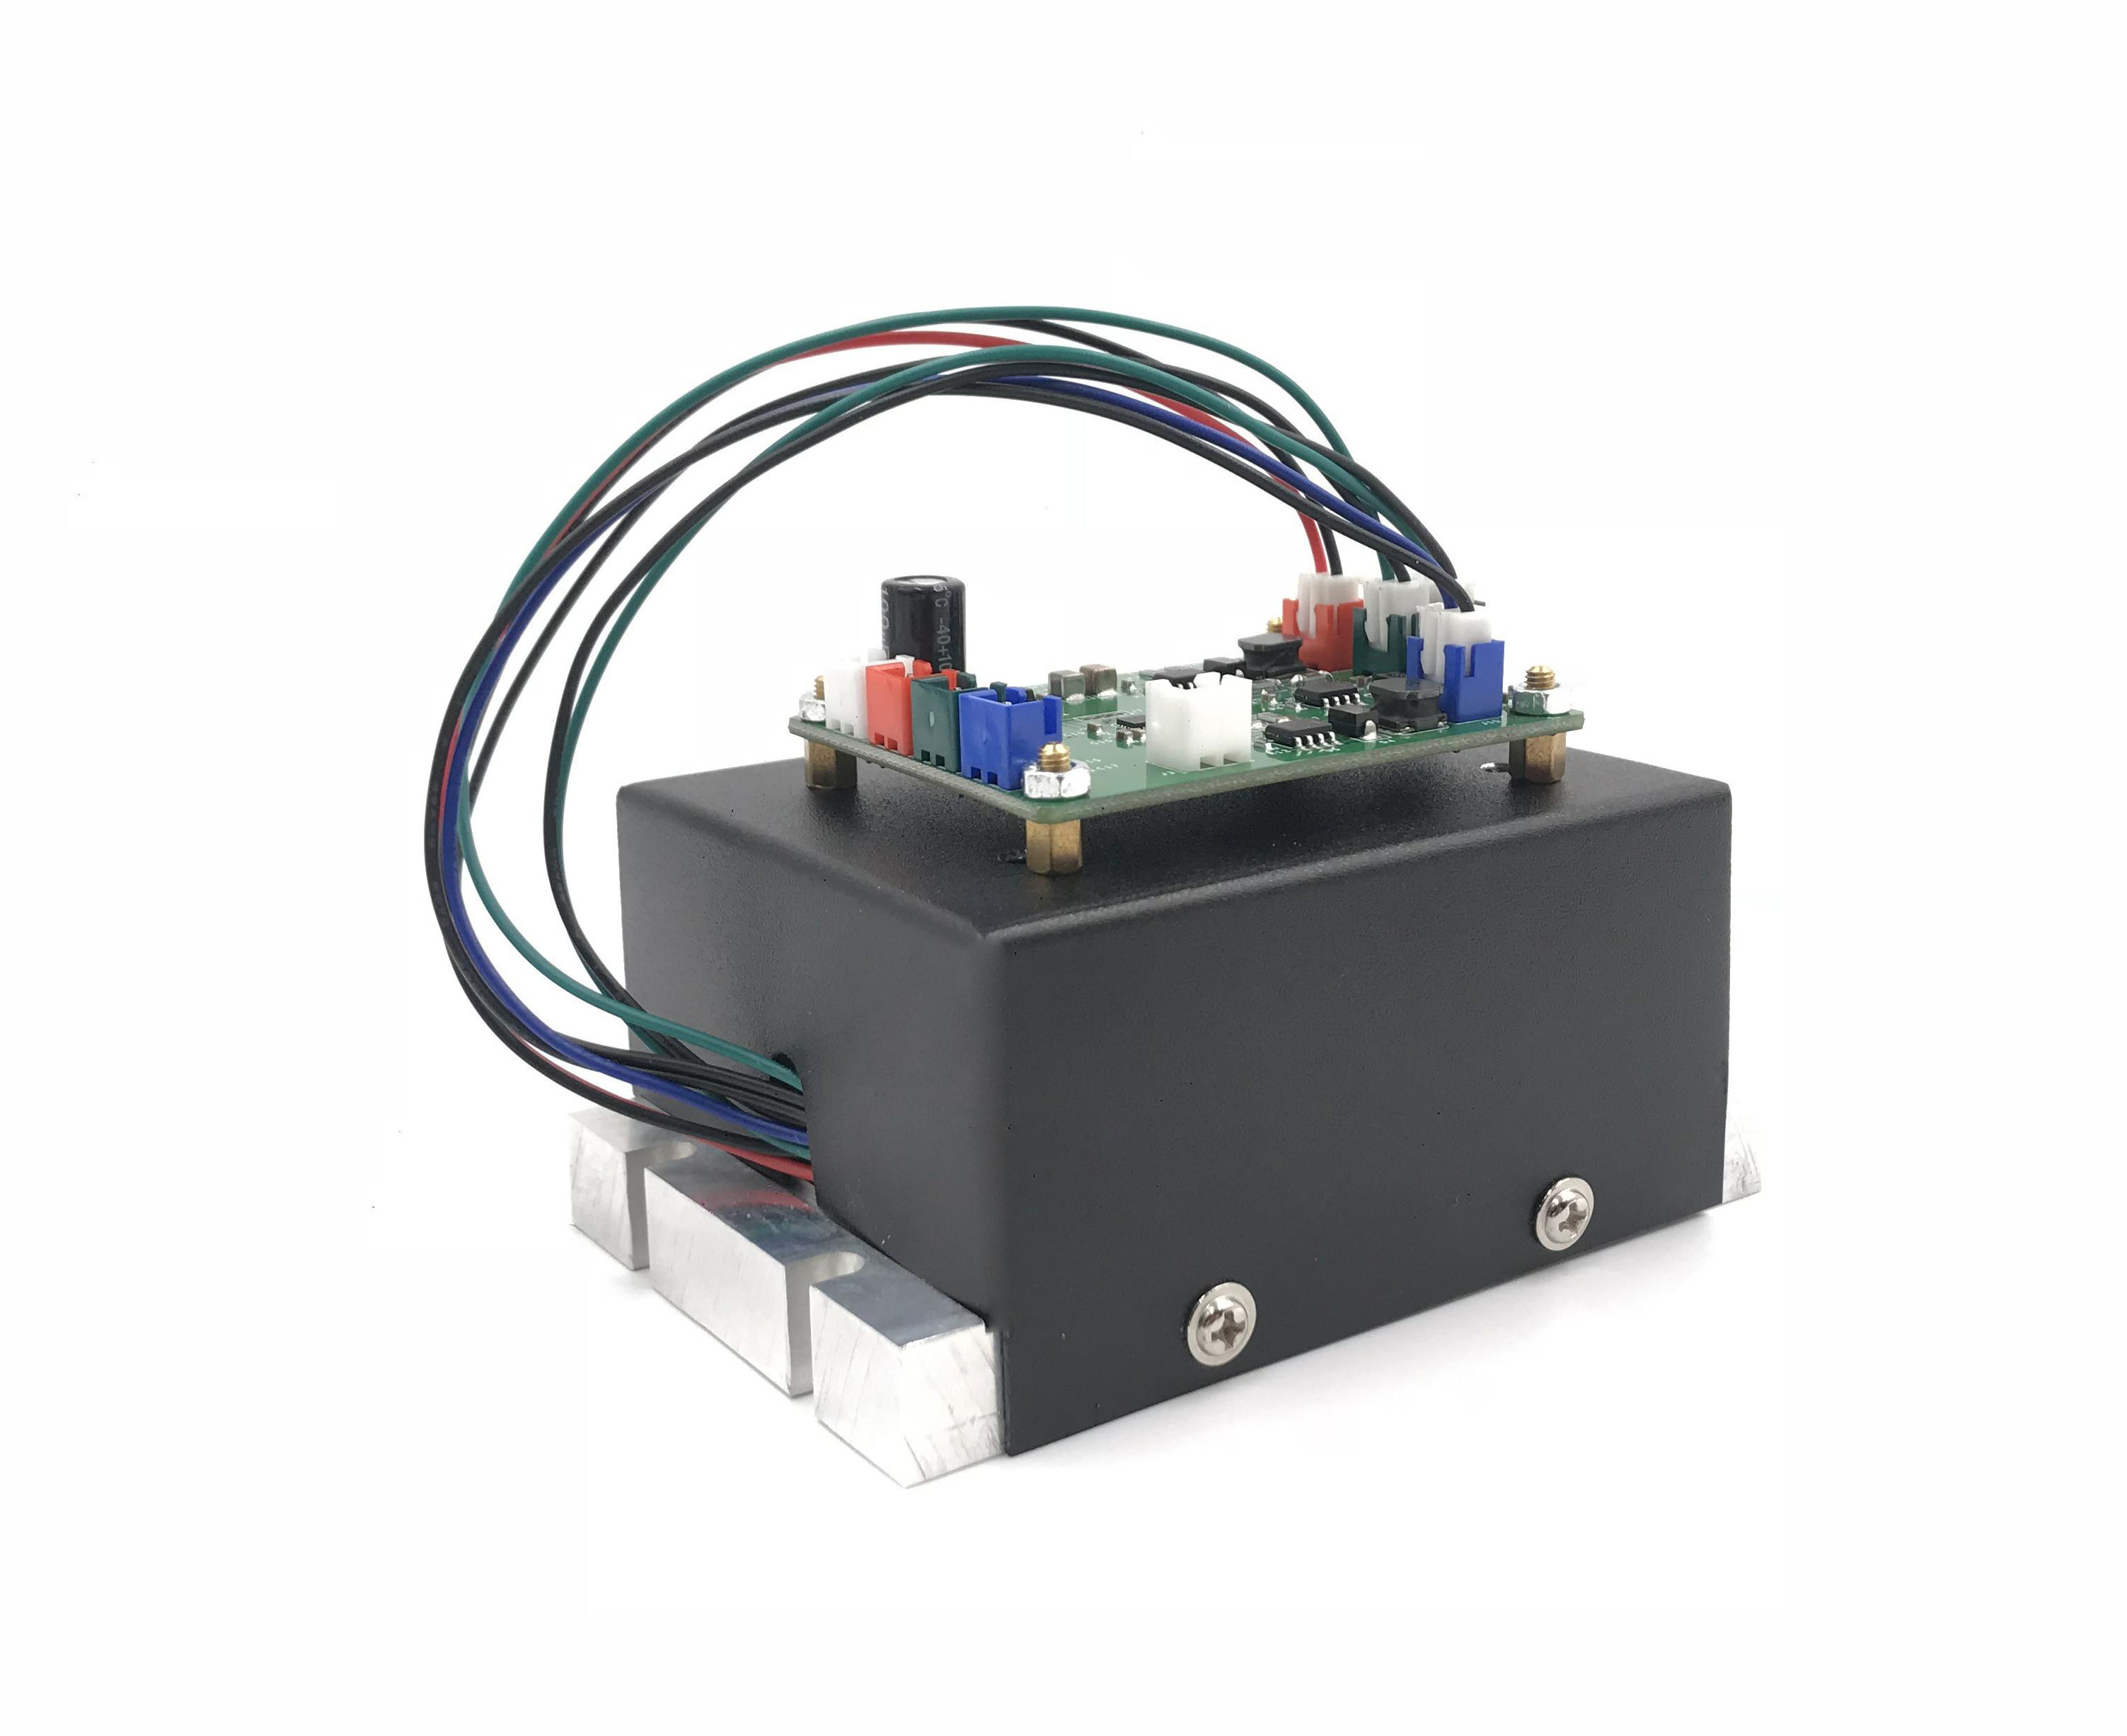 Resistor de película metálica THT 100x M0.6W-430R 430Ω 0.6W ± 1/% Ø2.5x6.8mm Royal Ohm